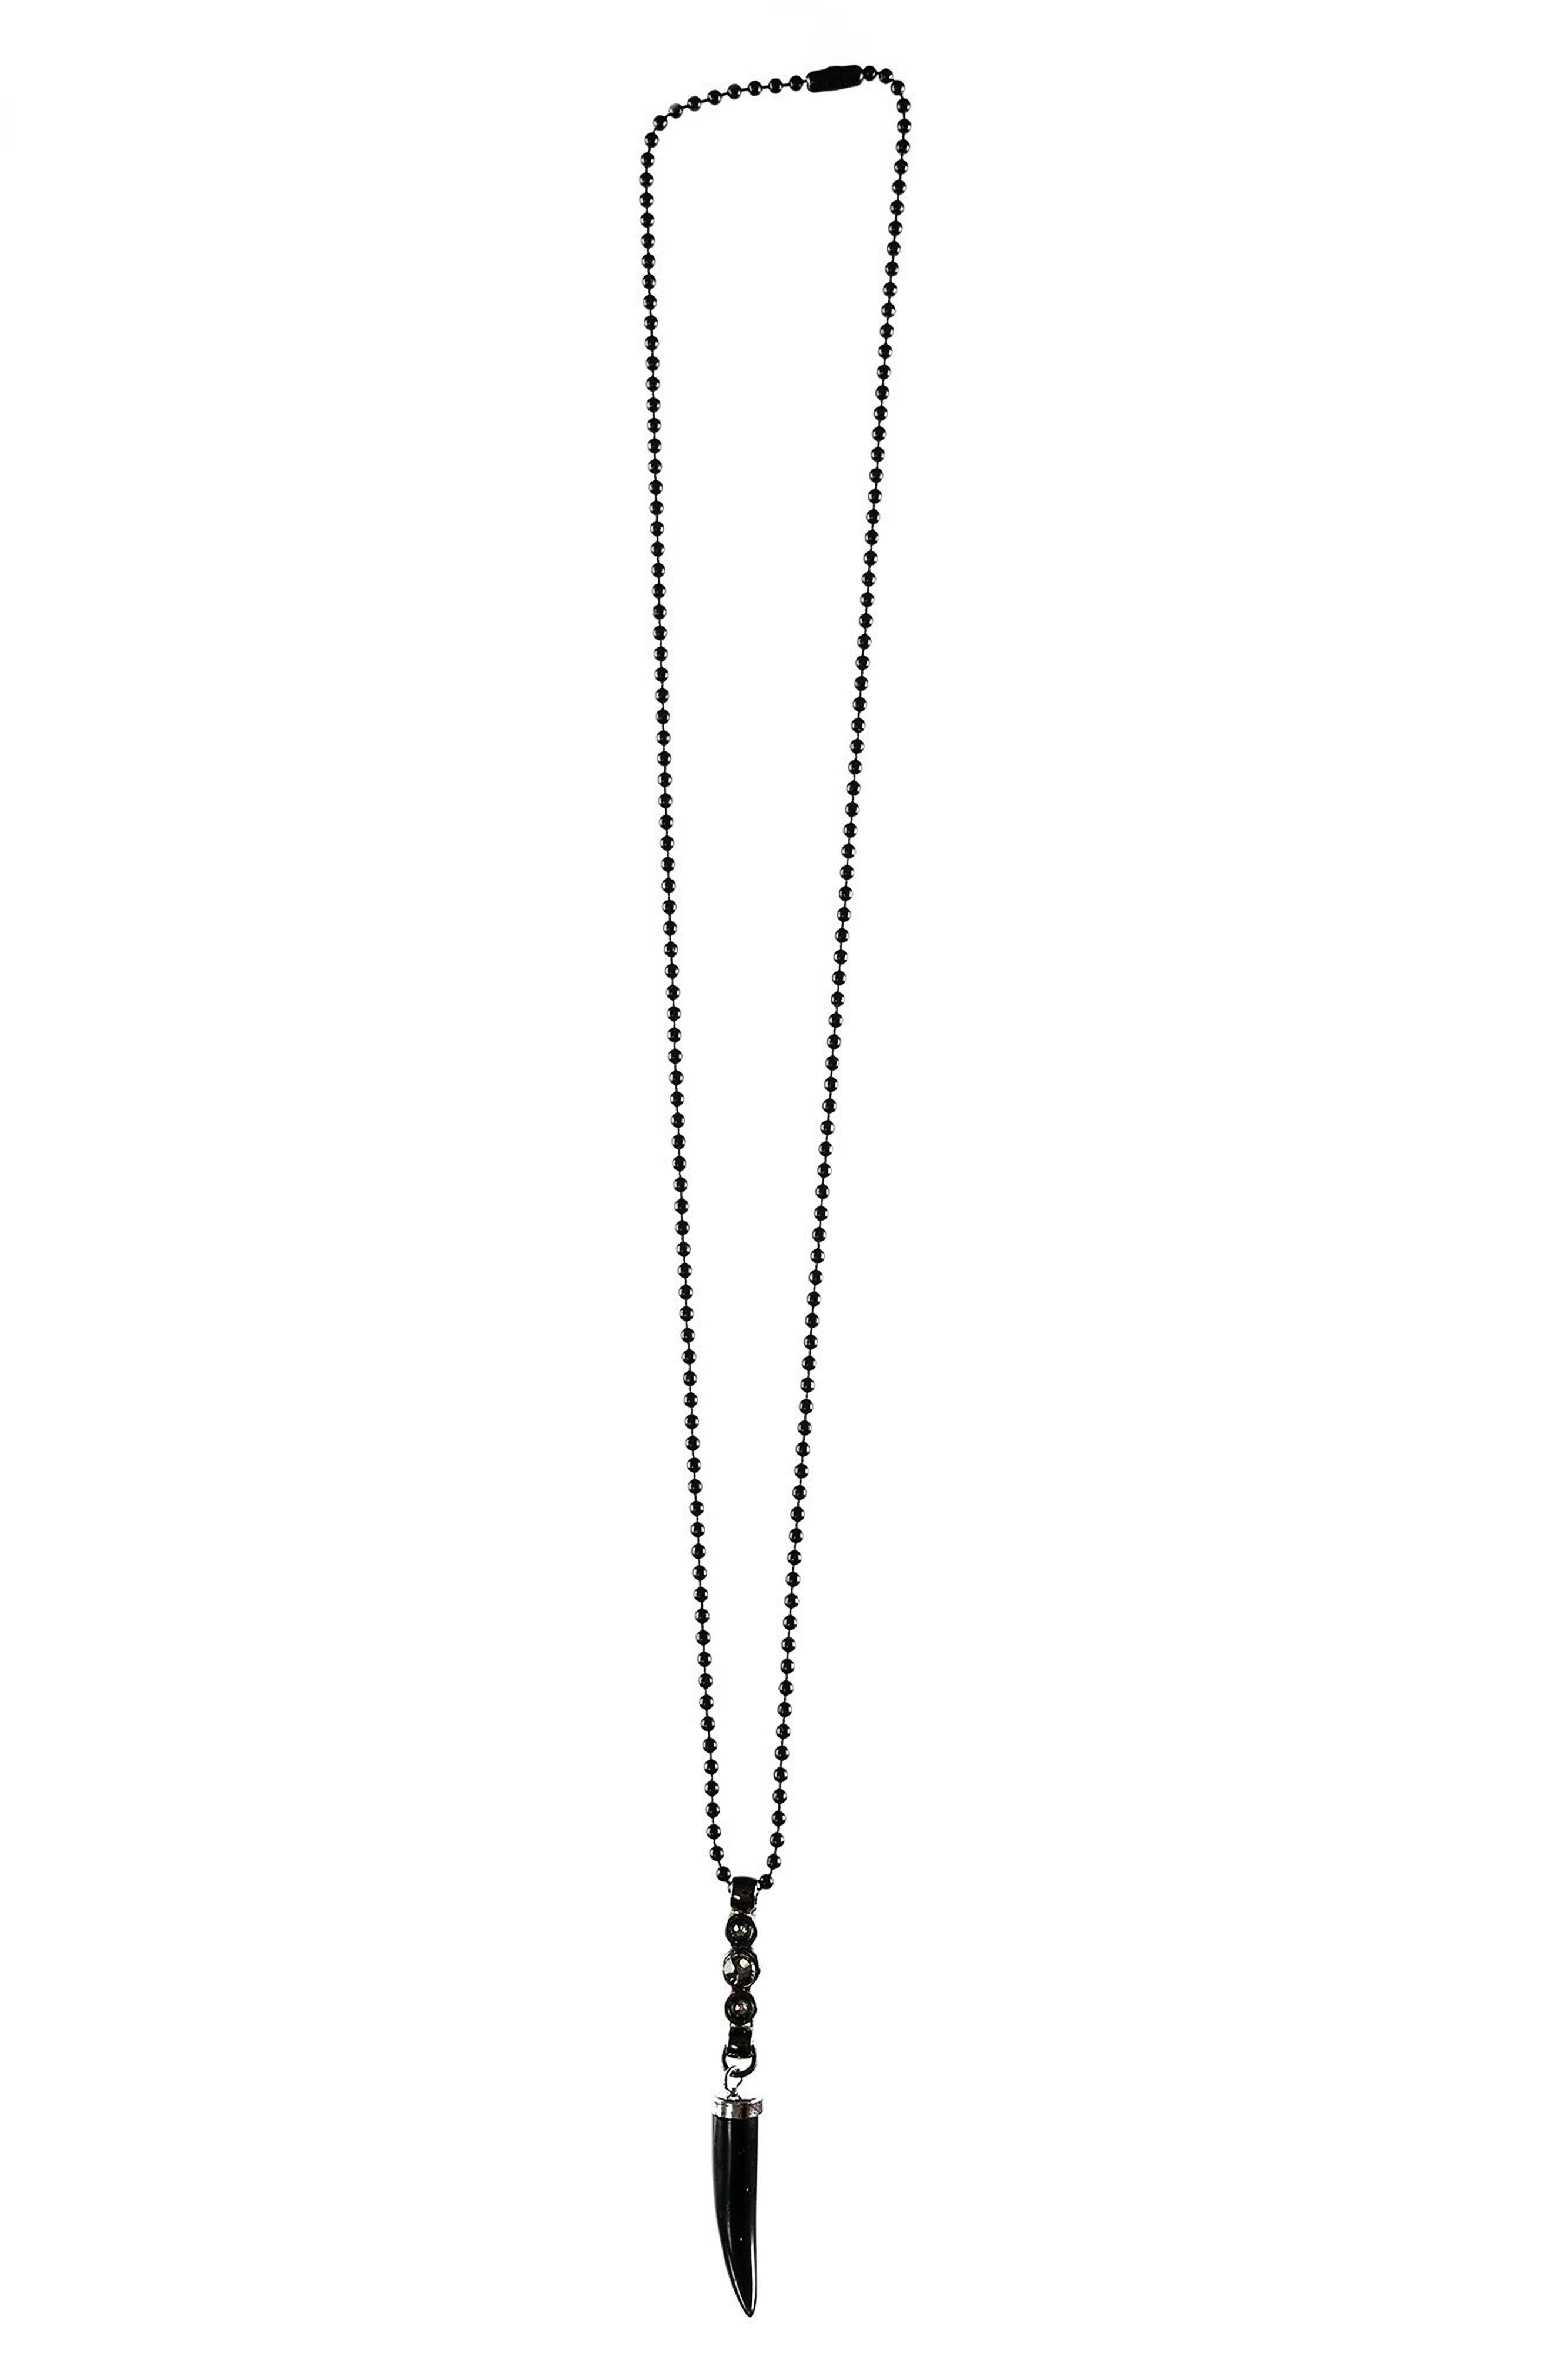 Horn Pendant Necklace,                         Main,                         color, Black Giamond Crystal Agate